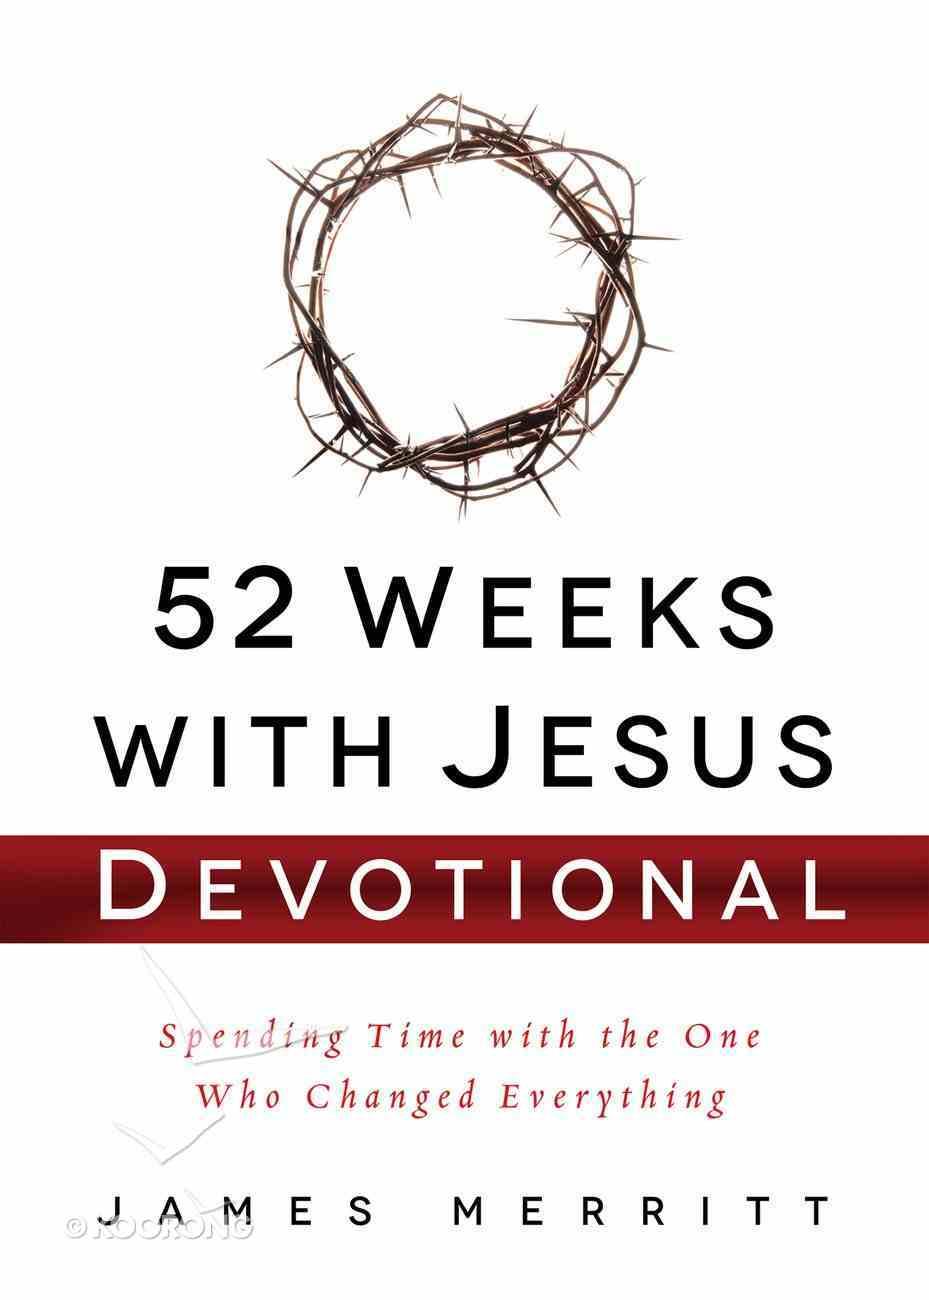 52 Weeks With Jesus Devotional eBook